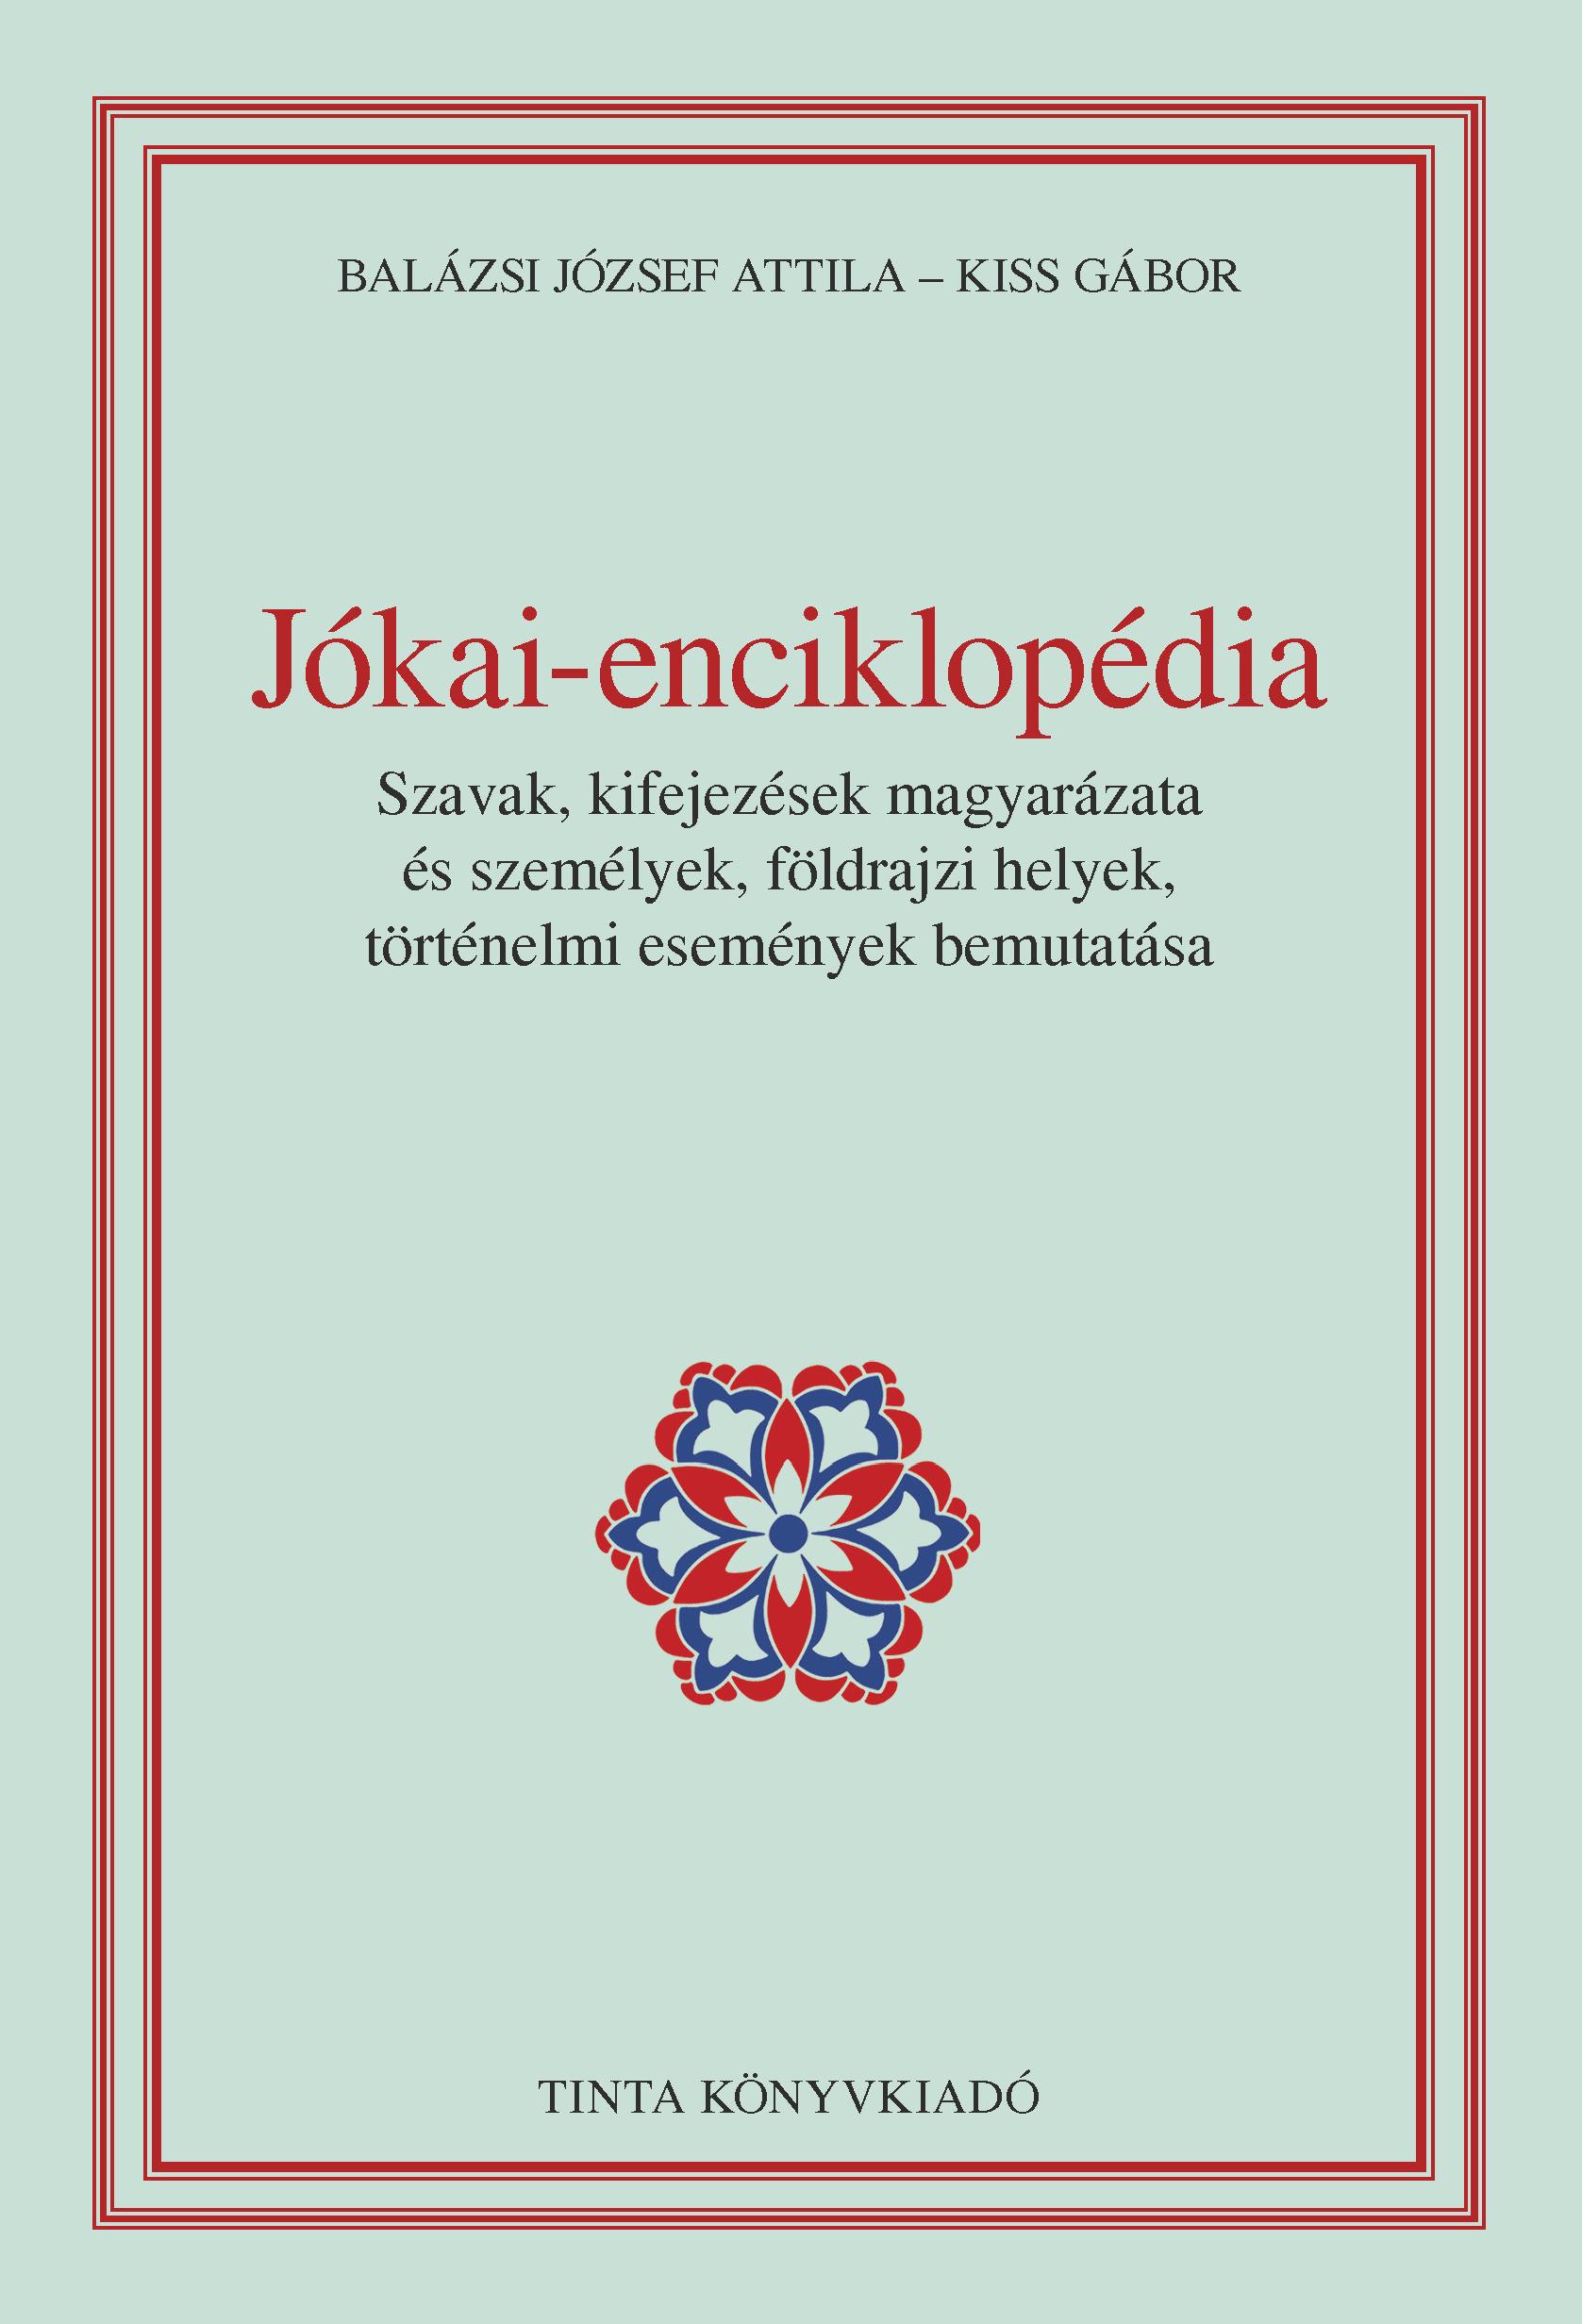 jokai-enciklopedia-cimlap.jpg